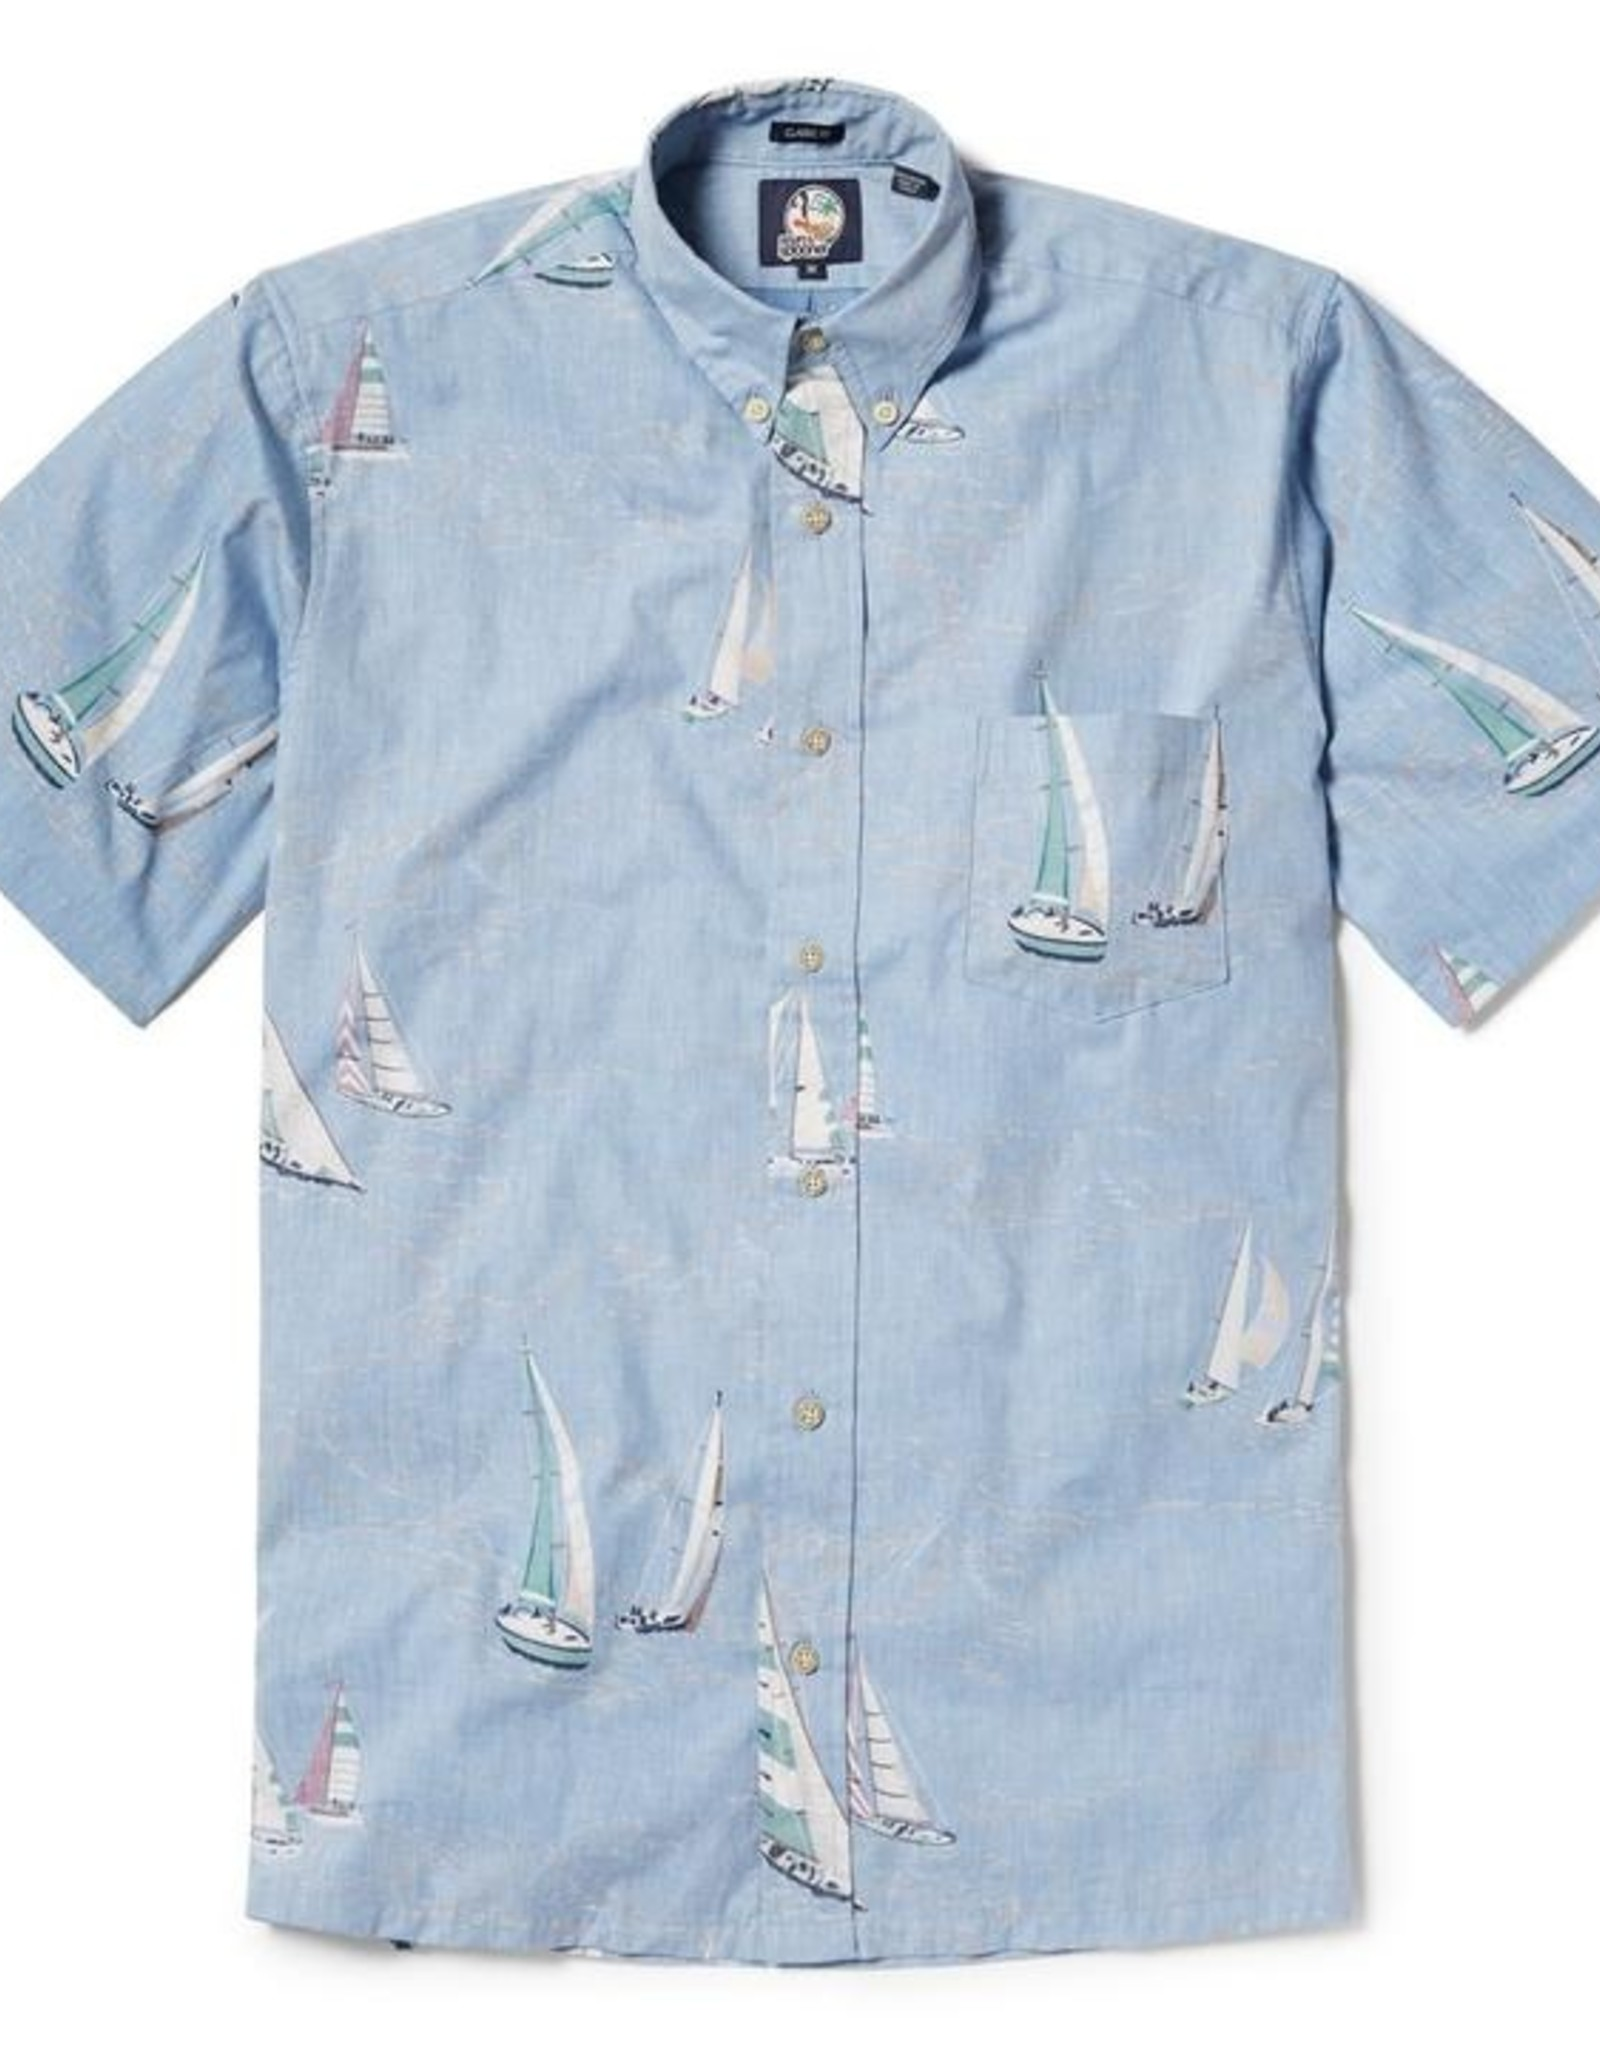 reyn spooner Tradewinds Regatta Shirt